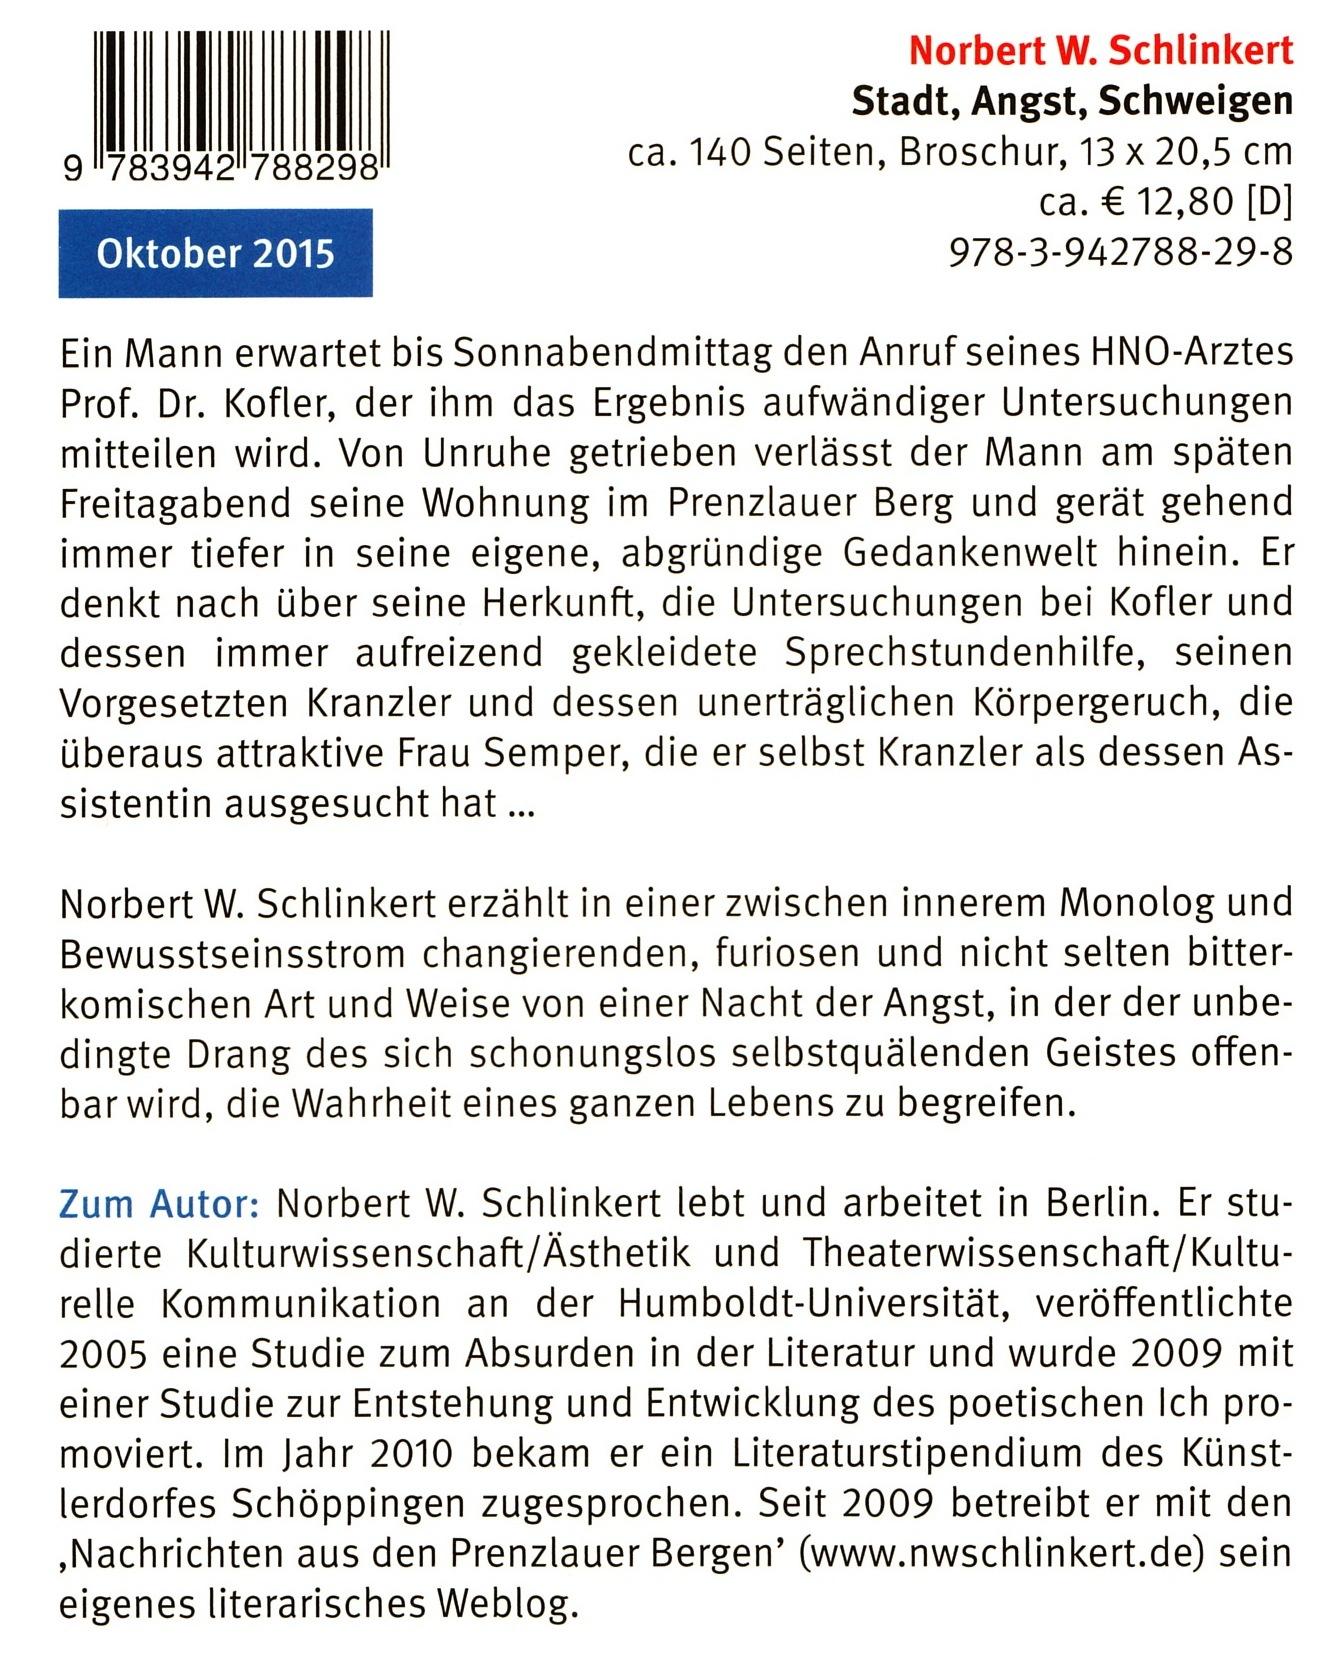 Norbert W. Schlinkert. Stadt, Angst, Schweigen. Elsinor Verlag, Okt.2015